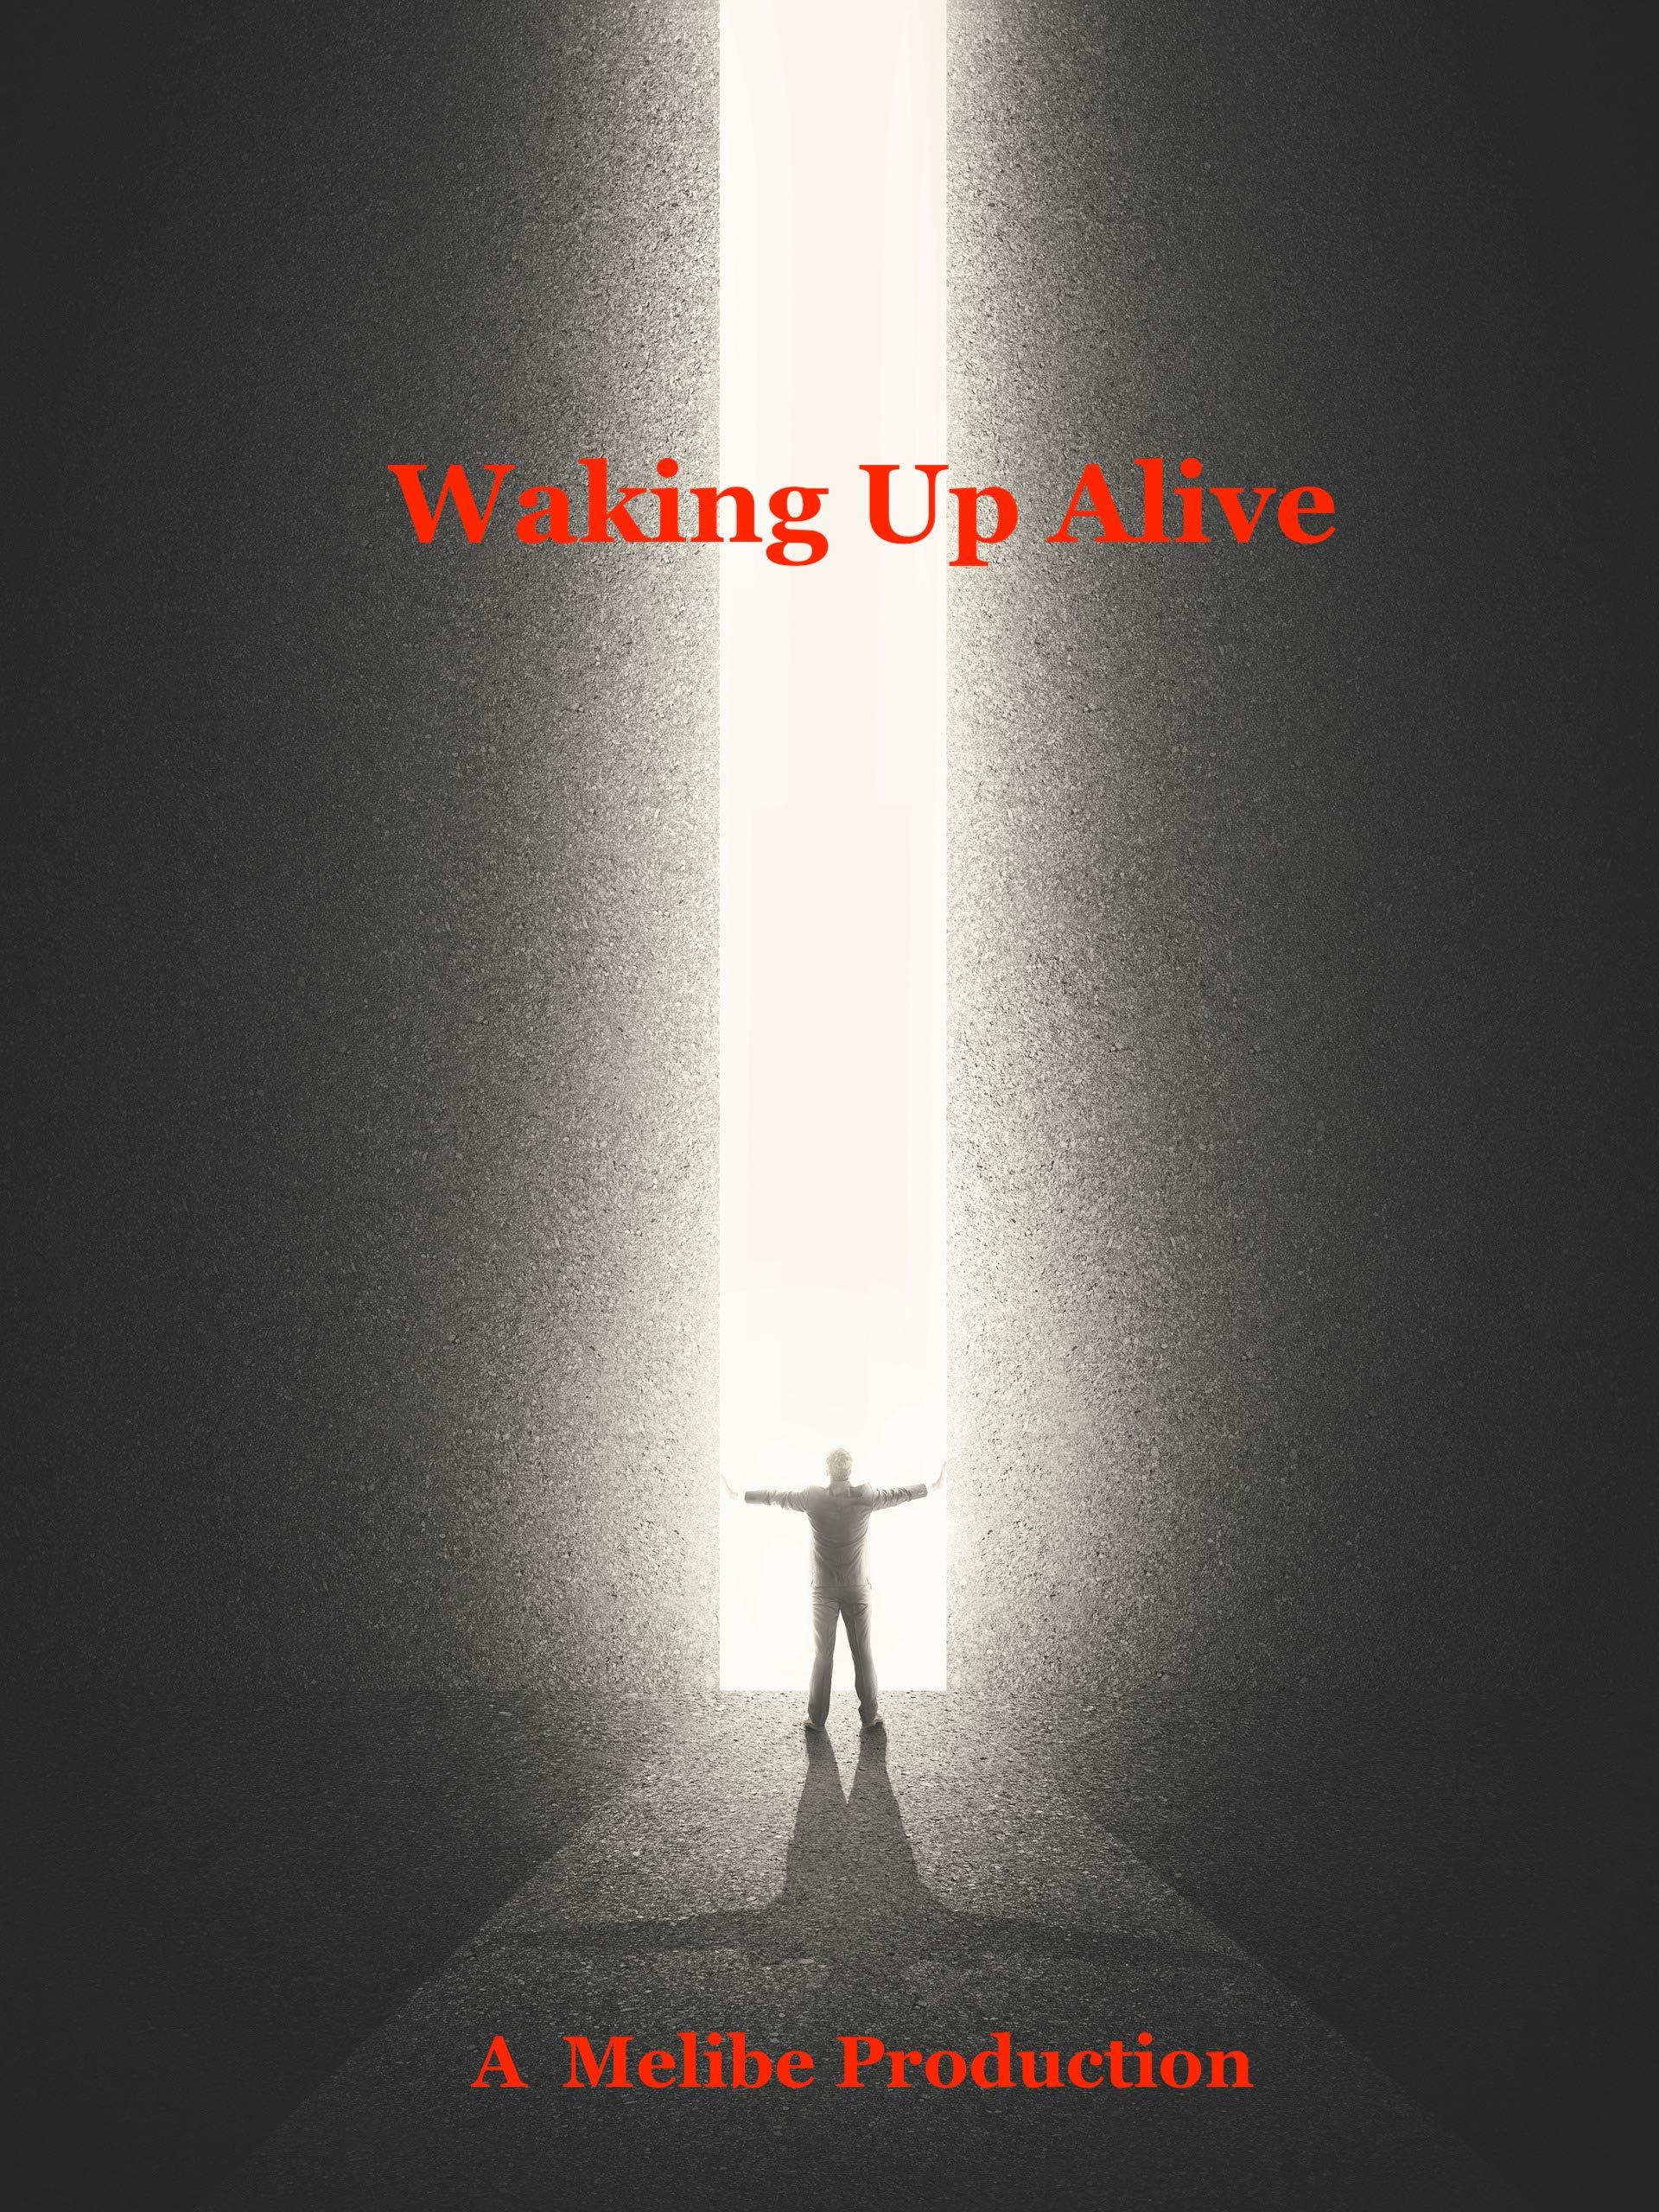 Waking Up Alive